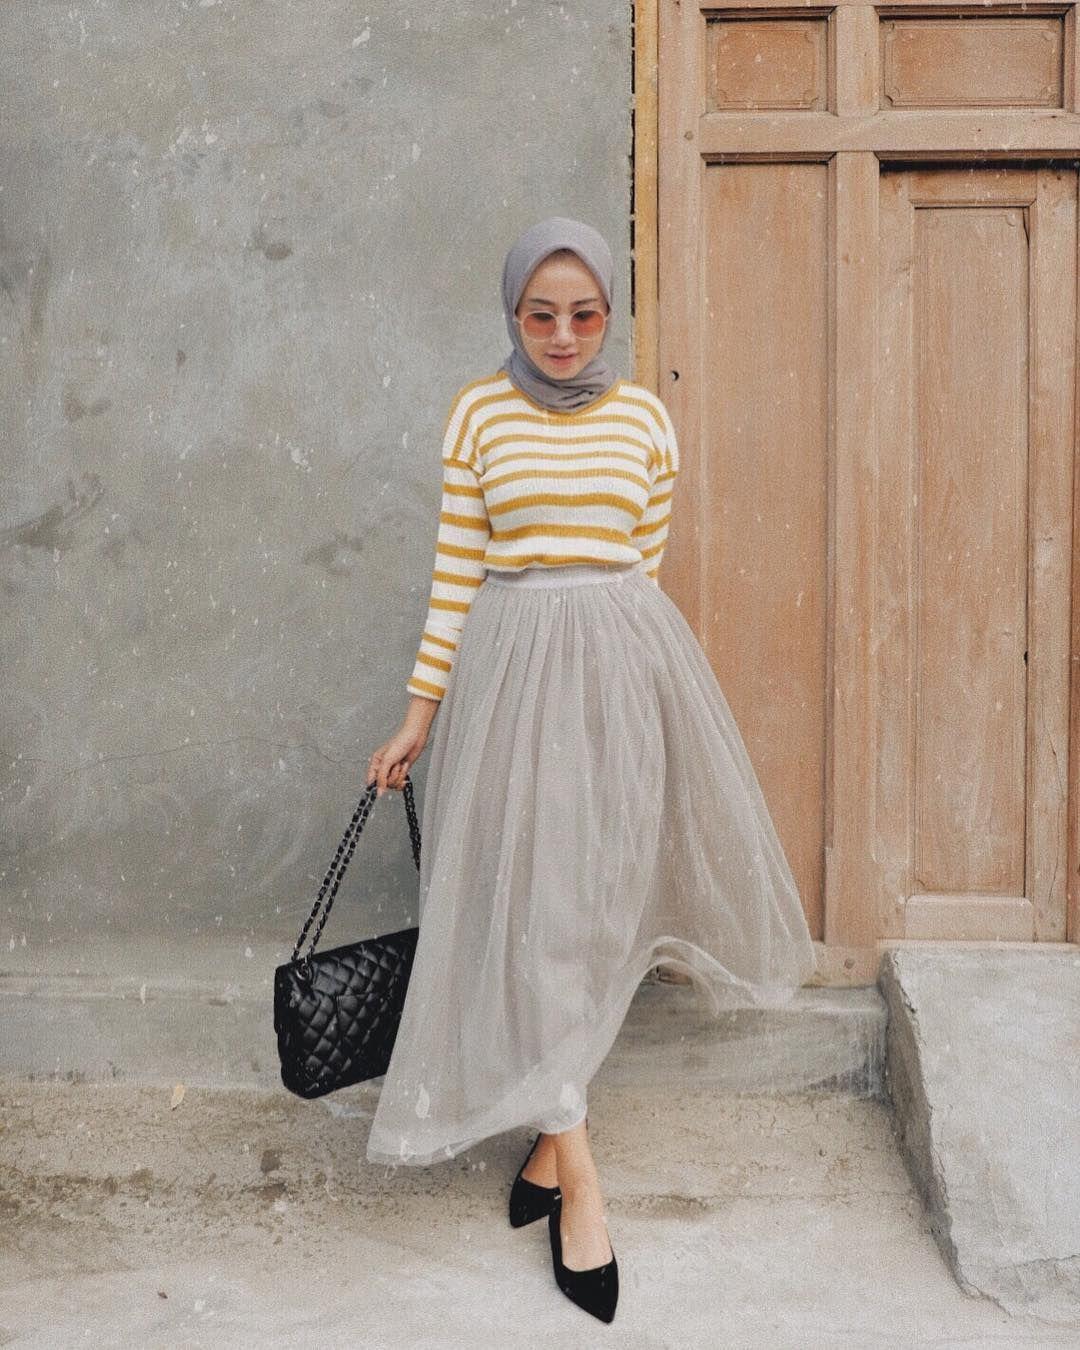 wush🌬 #ootd wearing tutu skirt from @rereyshop♥️ | Rok ...